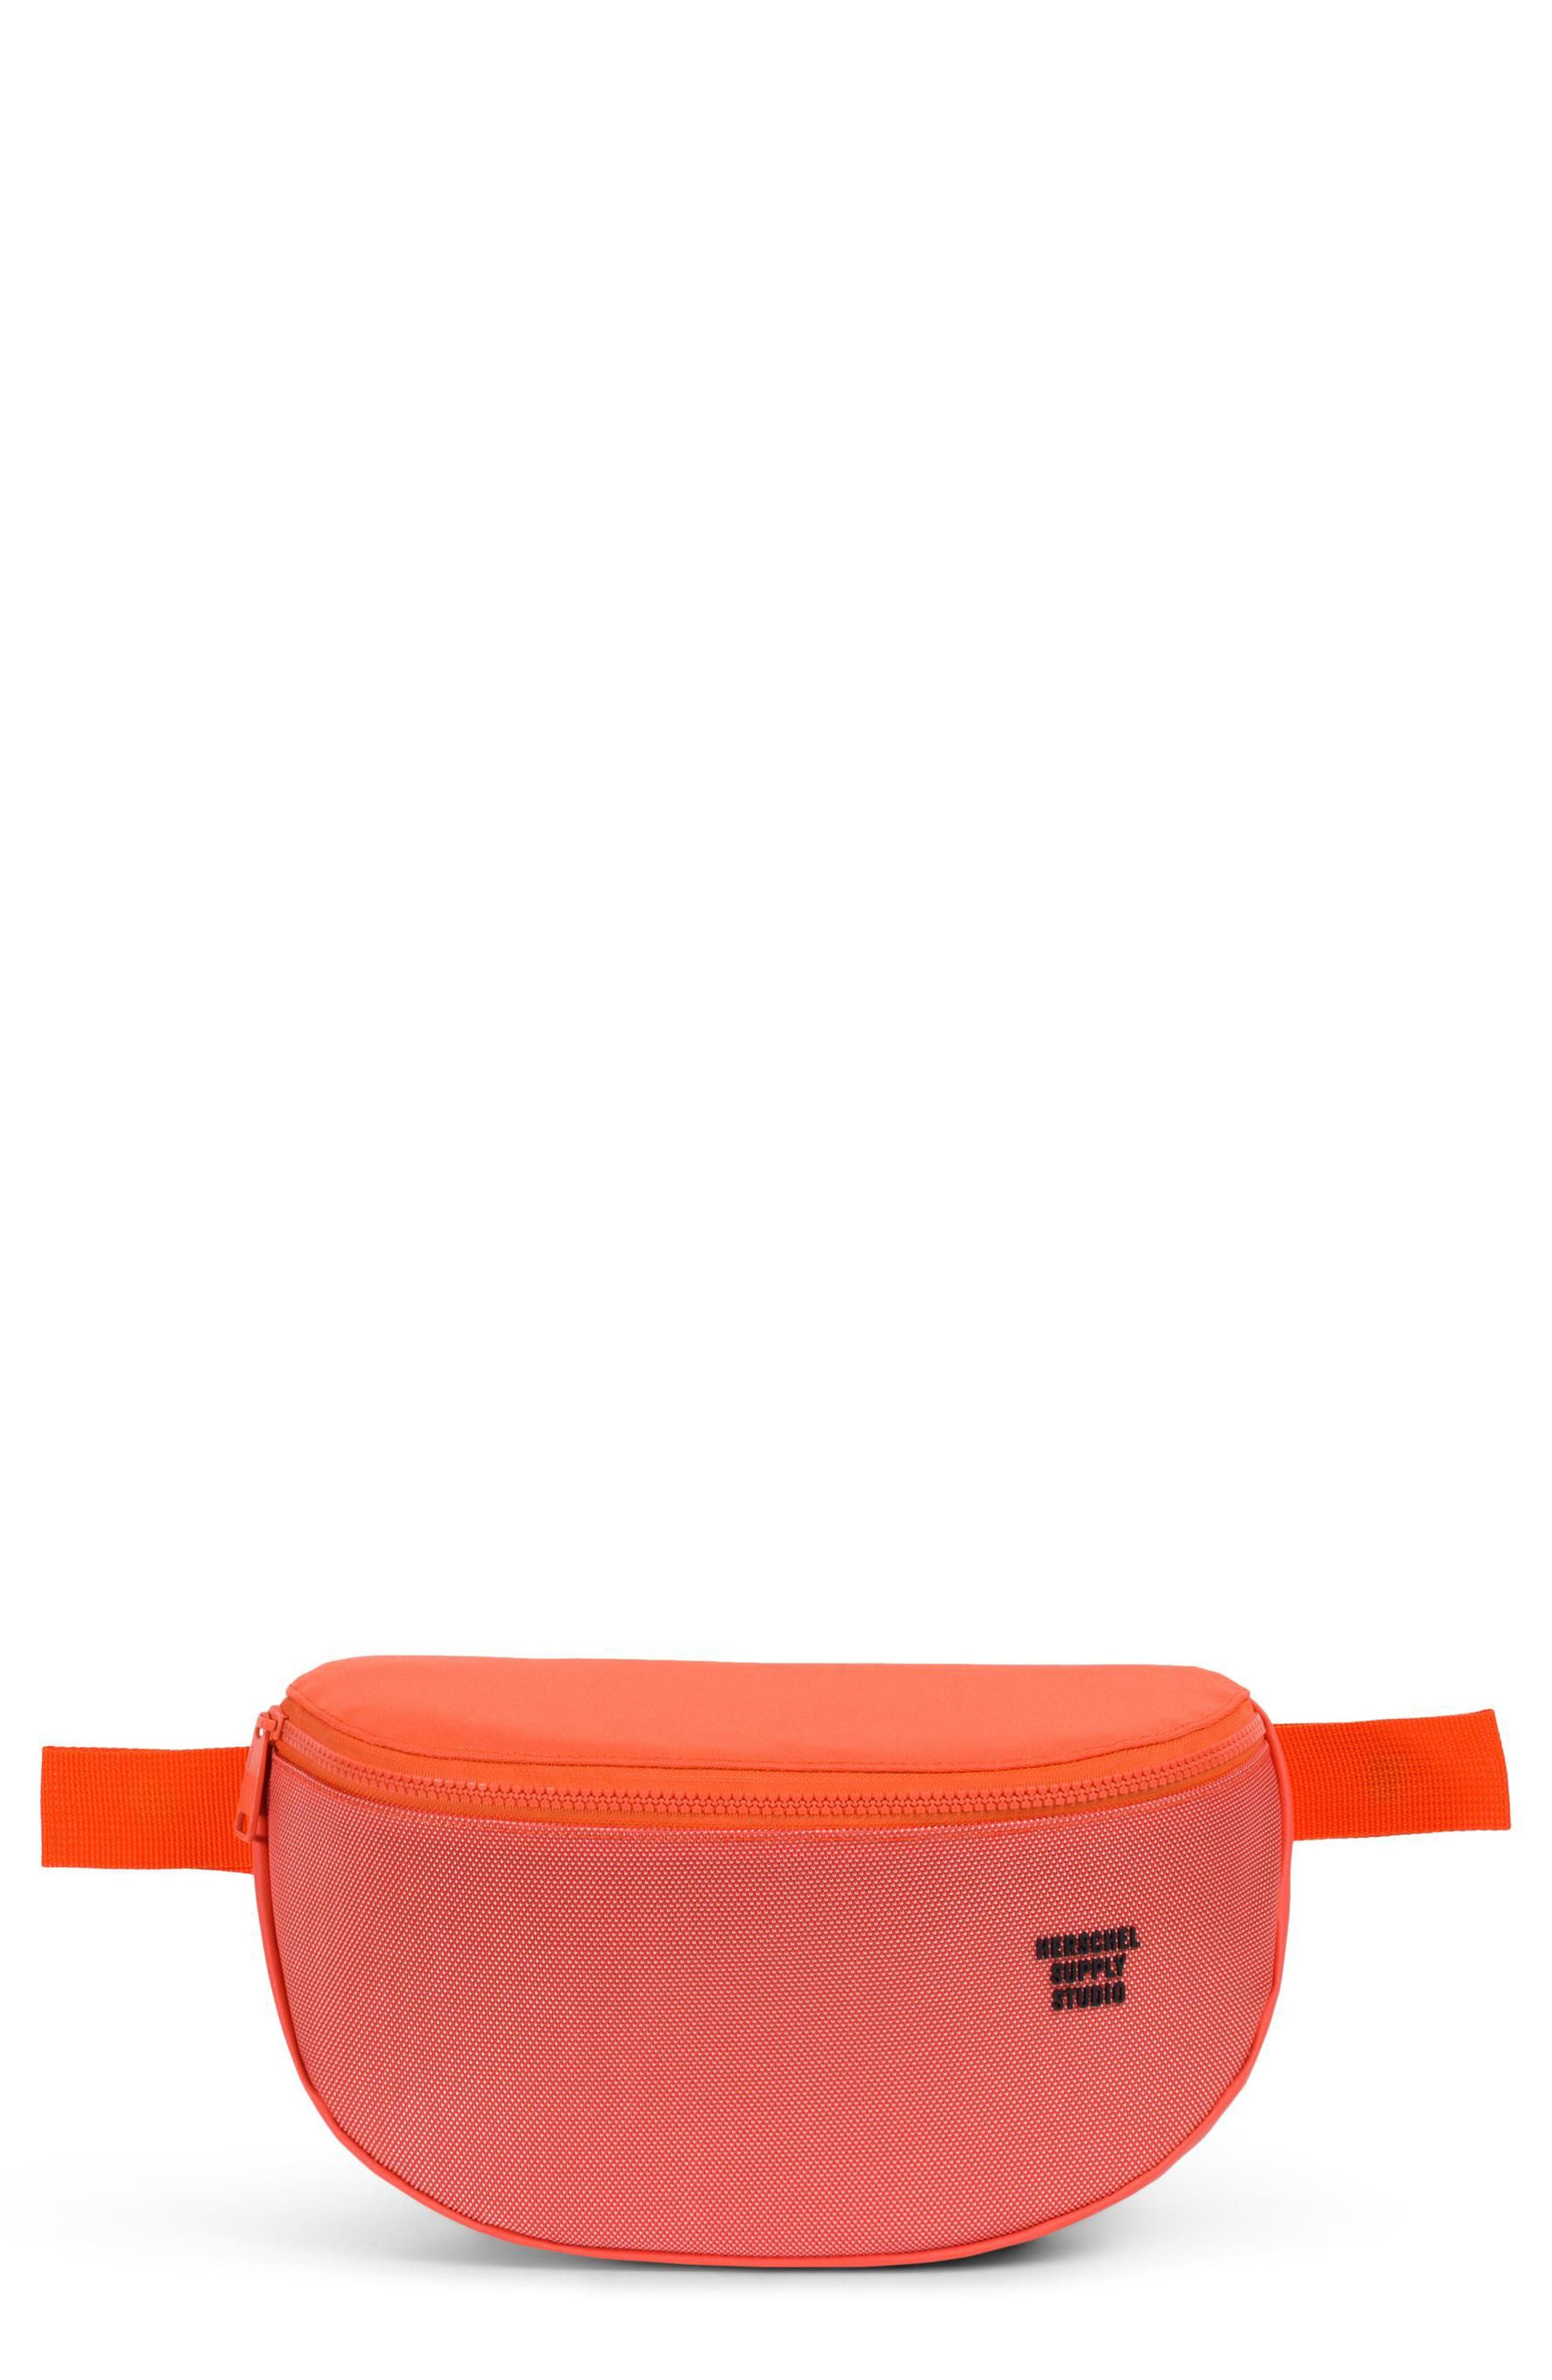 Sixteen Studio Belt Bag,                         Main,                         color, Vermillion Orange